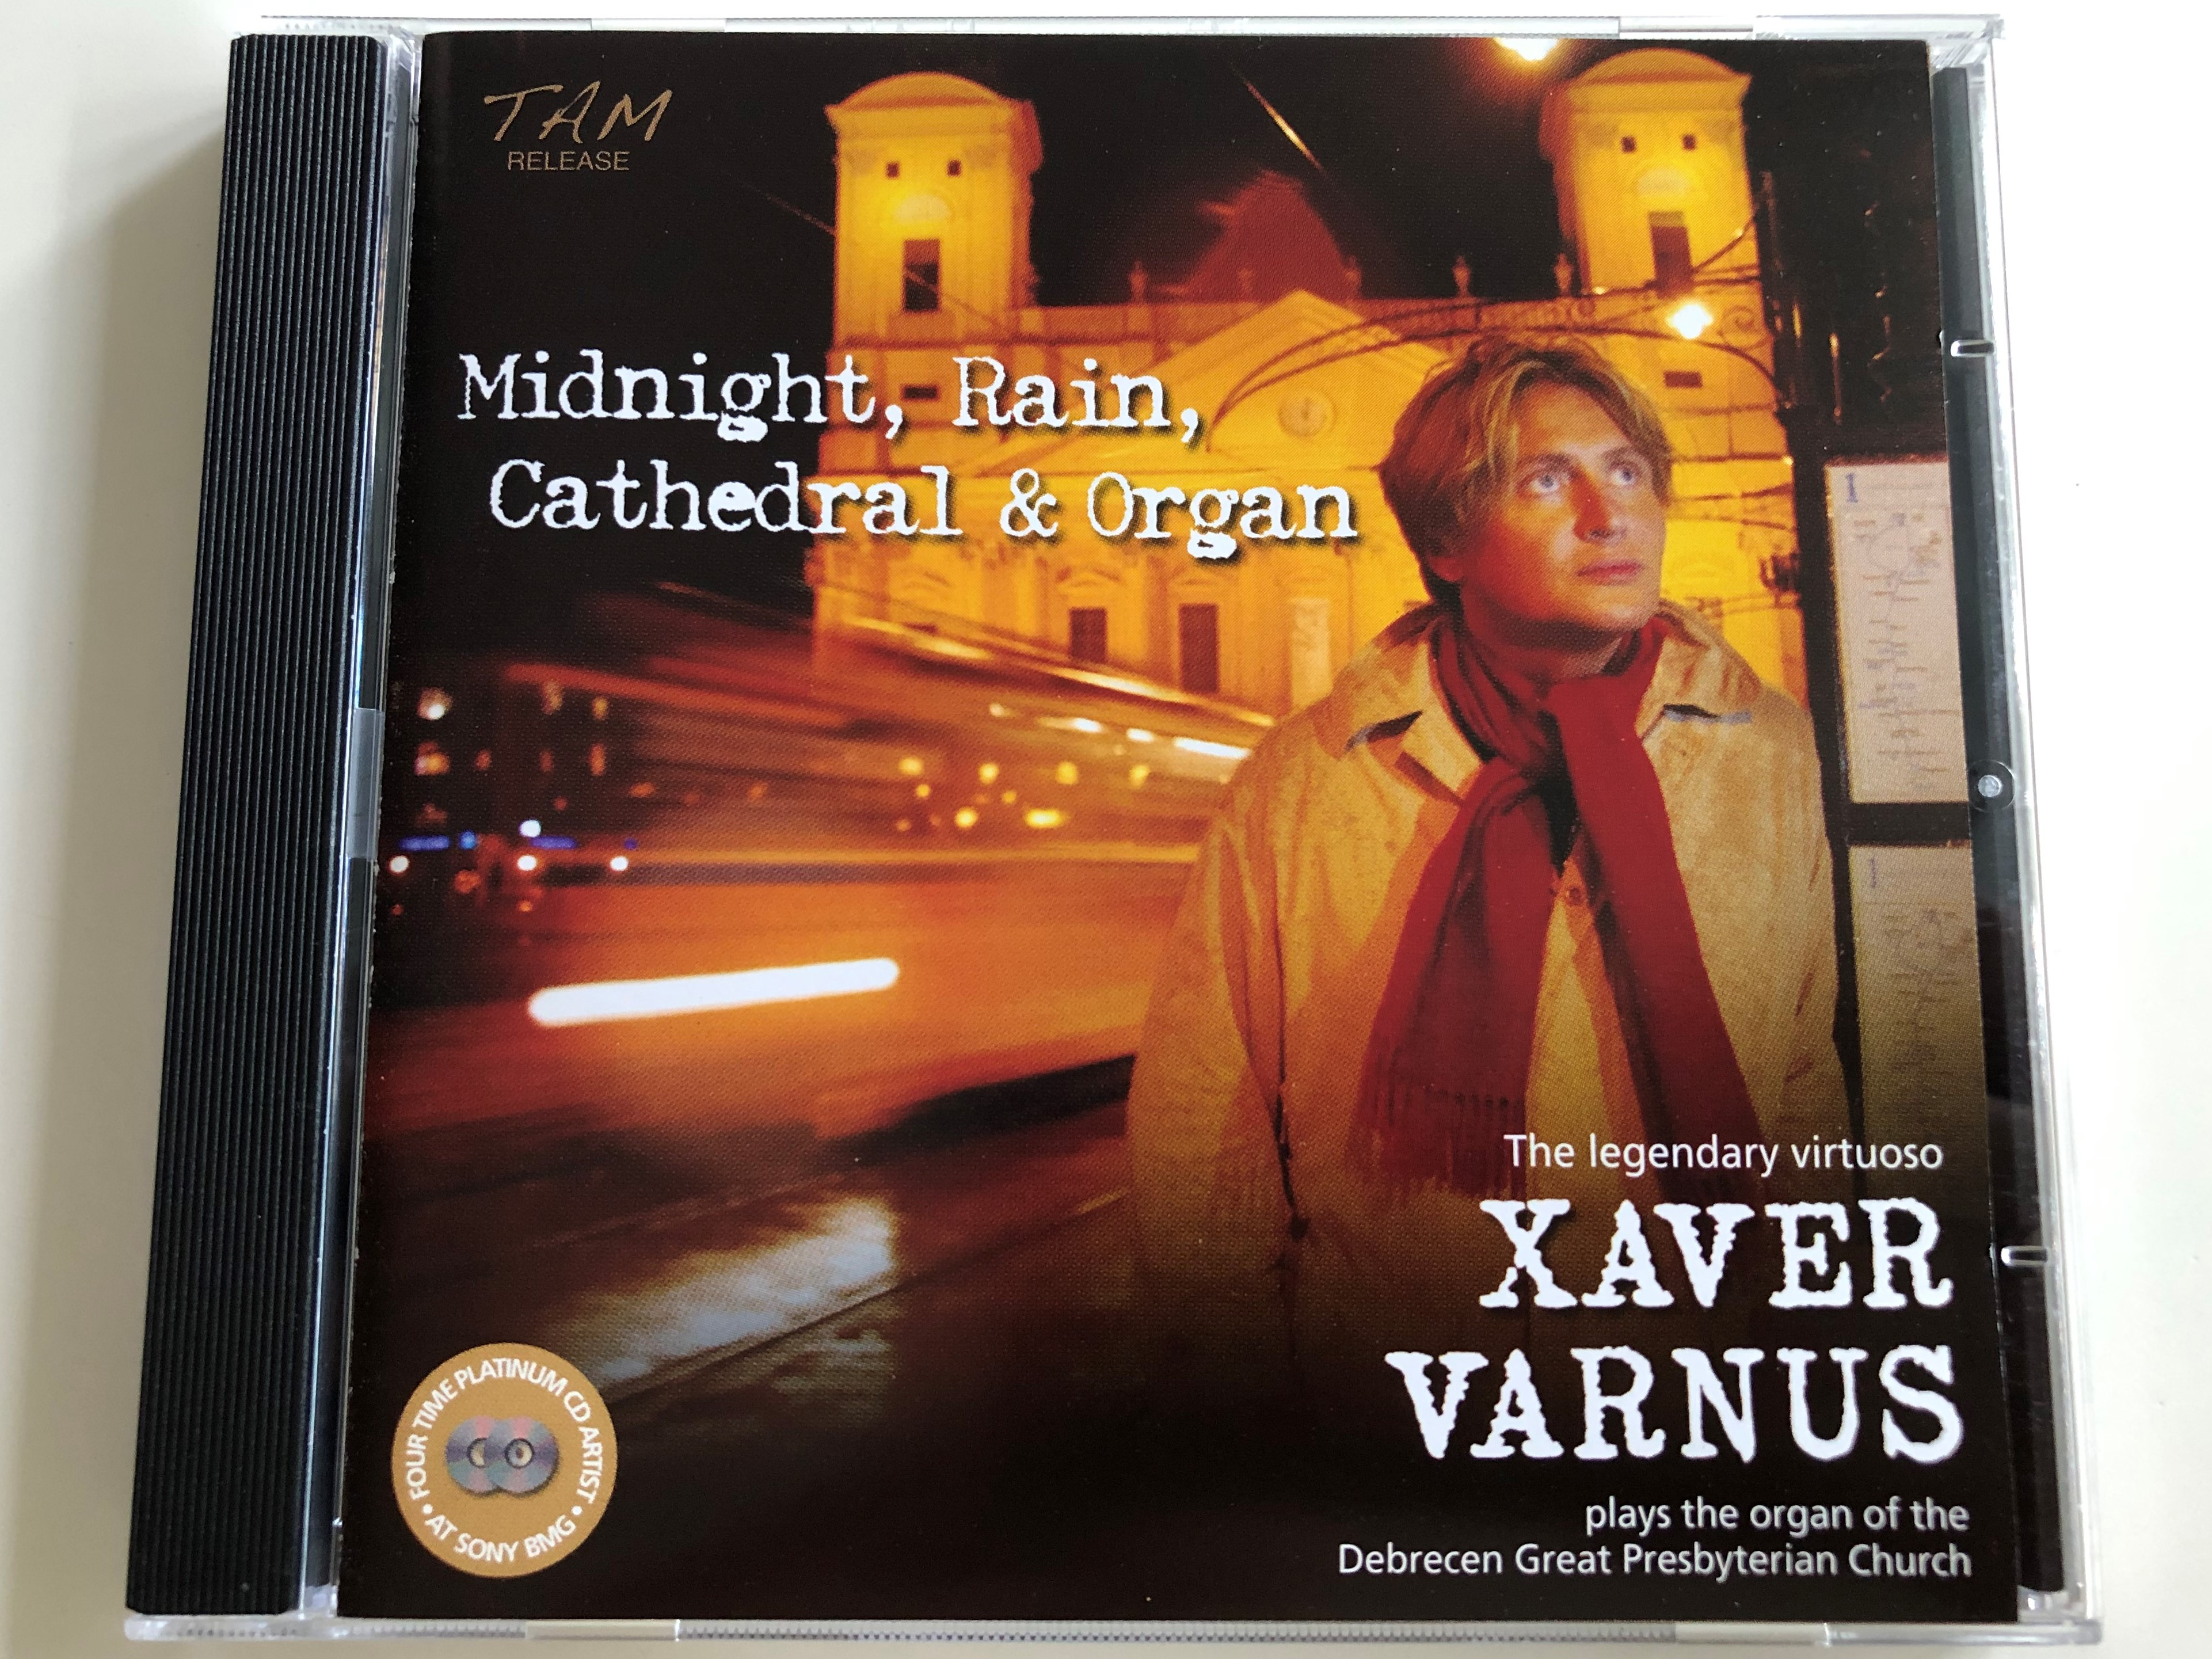 xaver-vanus-midnight-rain-cathedral-organ-the-legendary-virtuoso-plays-the-organ-of-the-debrecen-great-presbyterian-church-audio-cd-2008-tam-release-tam-1007-87538-653-1-.jpg